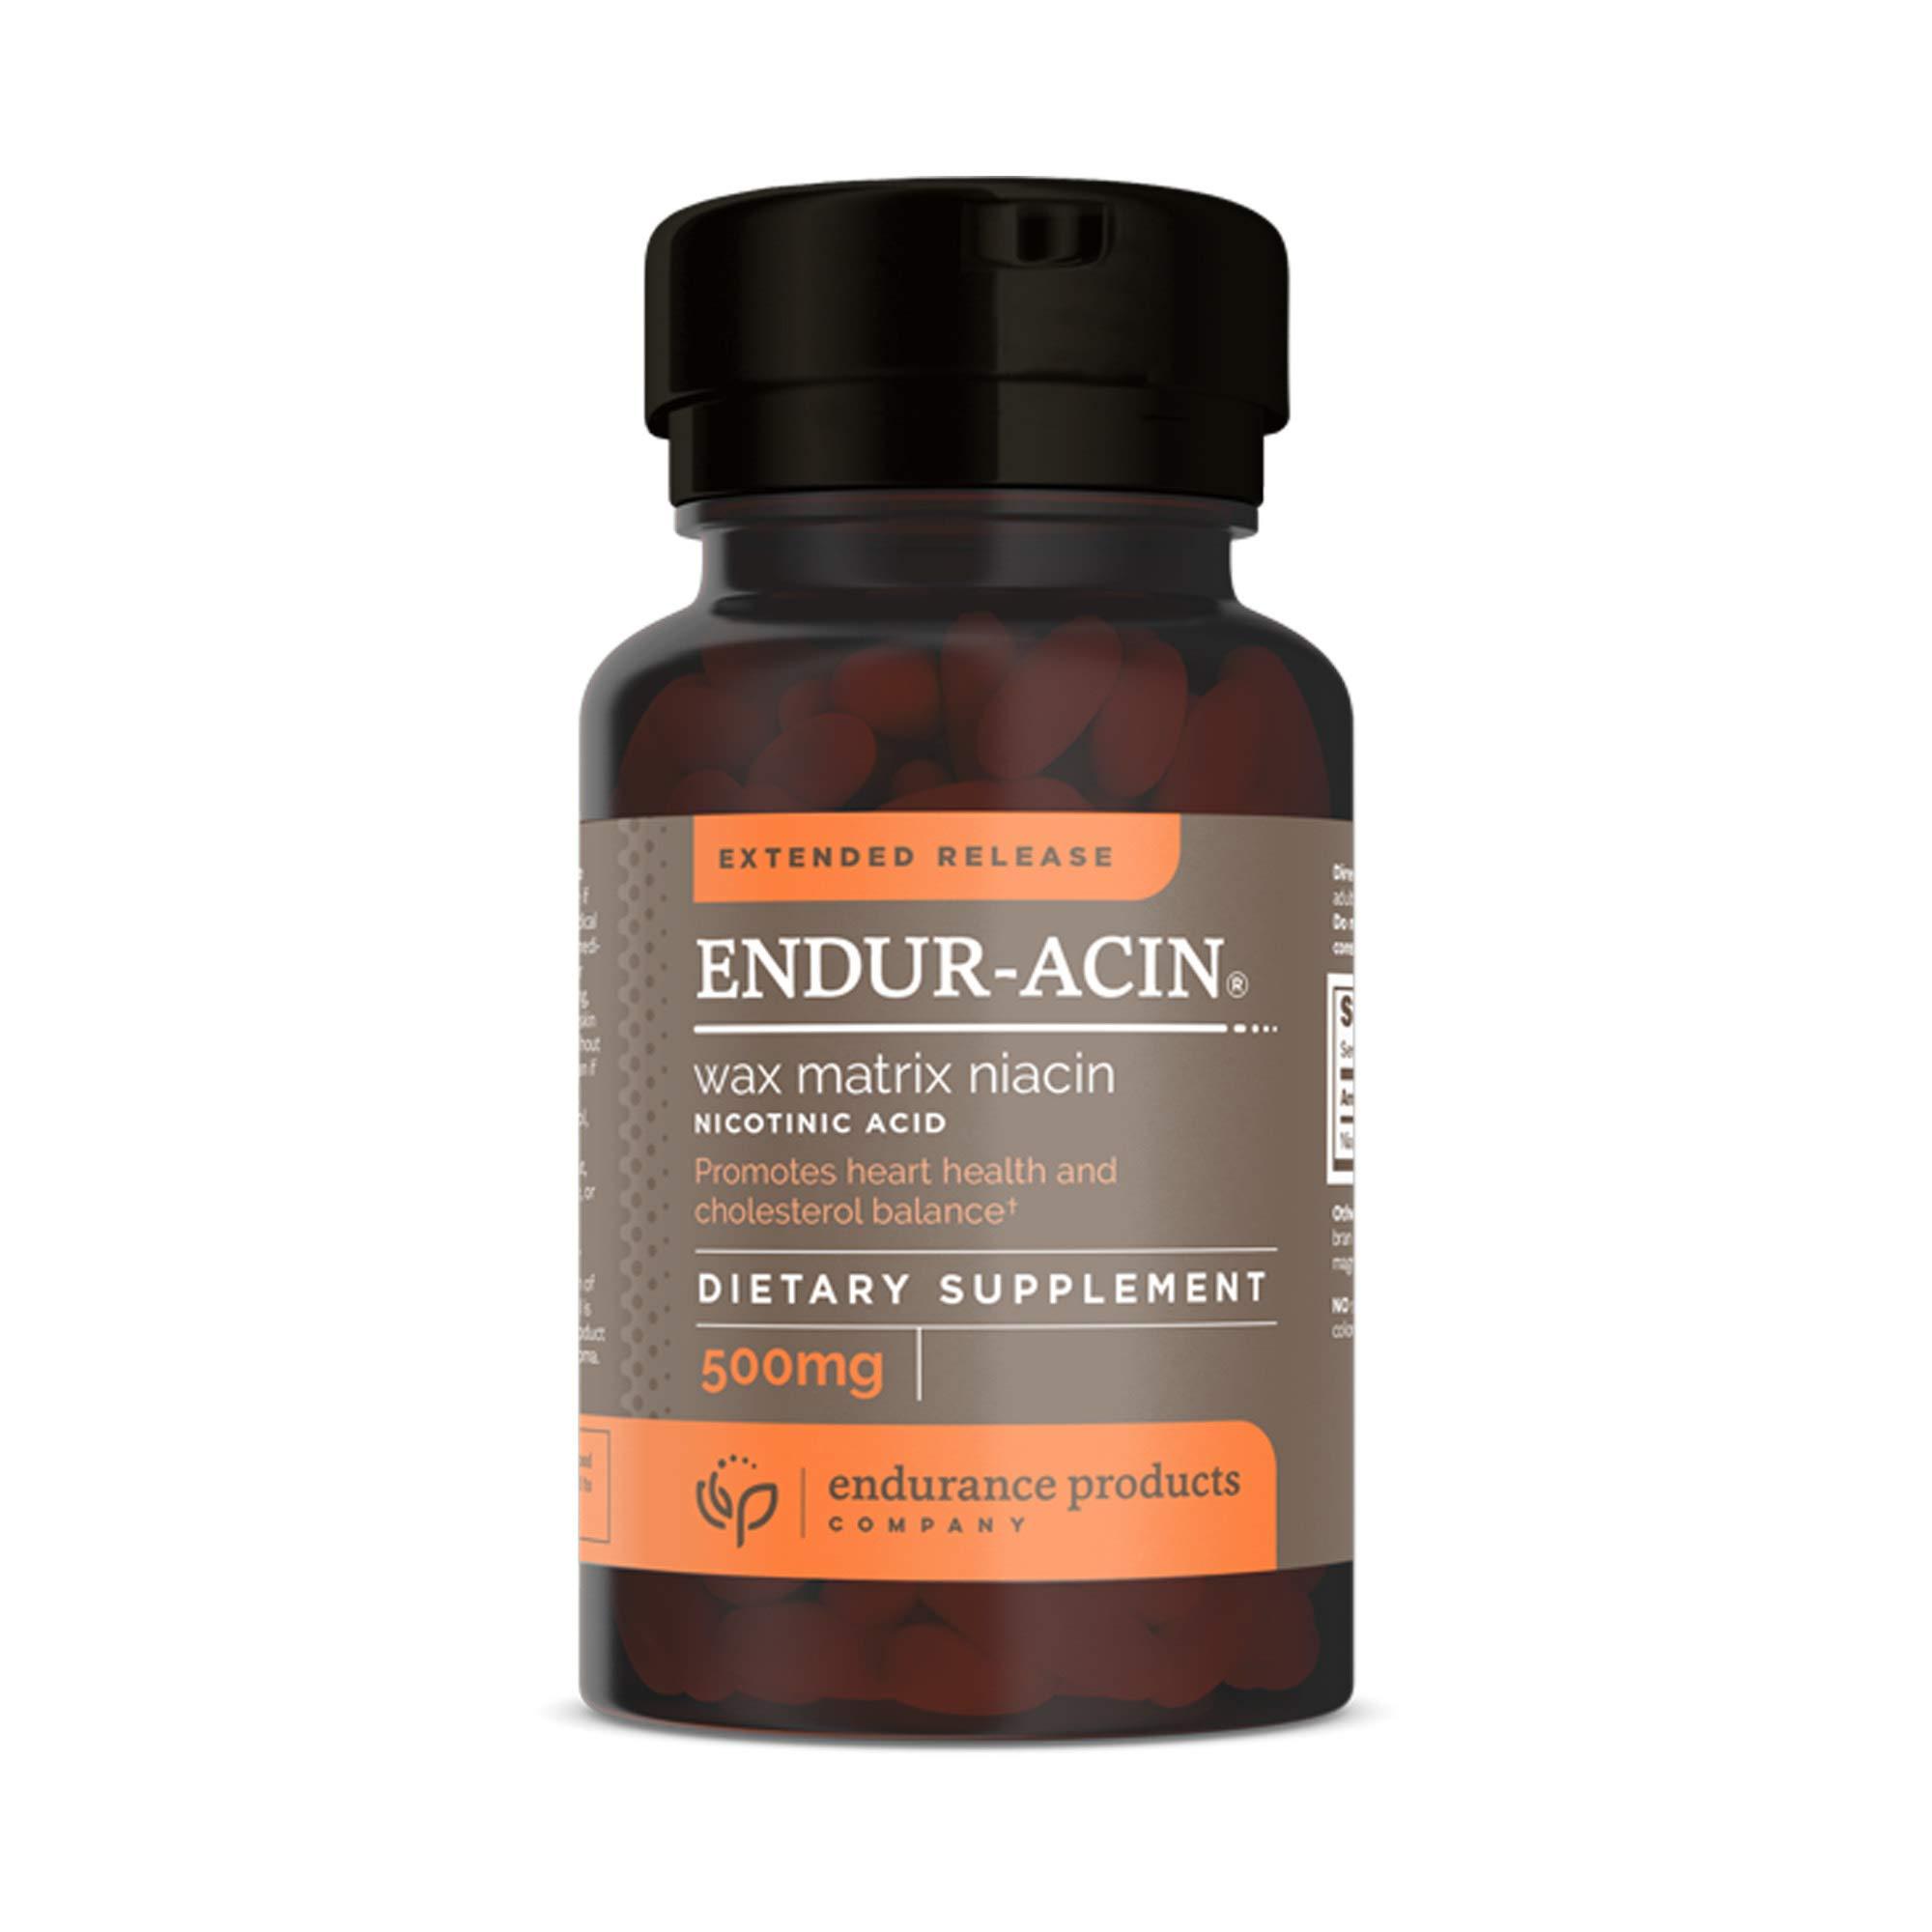 Extended Release ENDUR-ACIN® Wax Matrix Niacin (Nicotinic Acid) 500mg 100 Tablets - Pack of 2